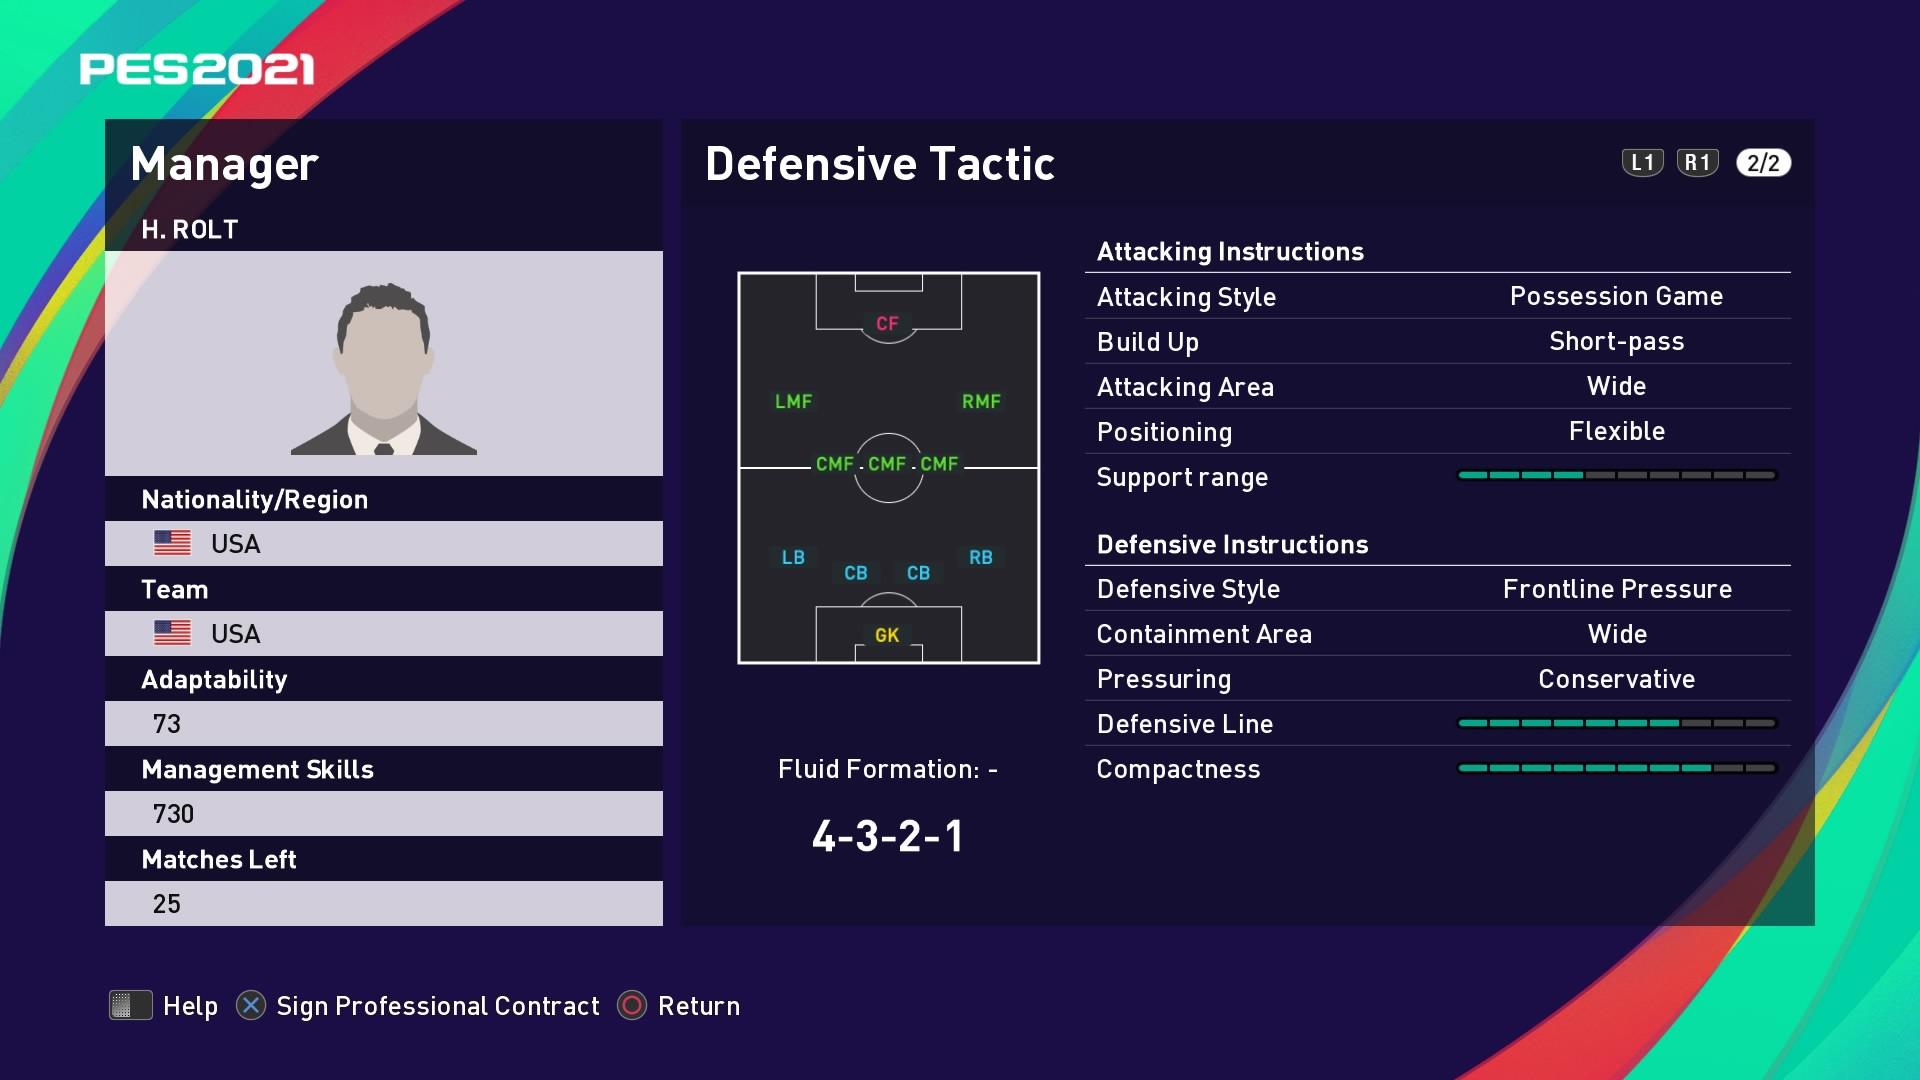 H. Rolt (Gregg Berhalter) Defensive Tactic in PES 2021 myClub